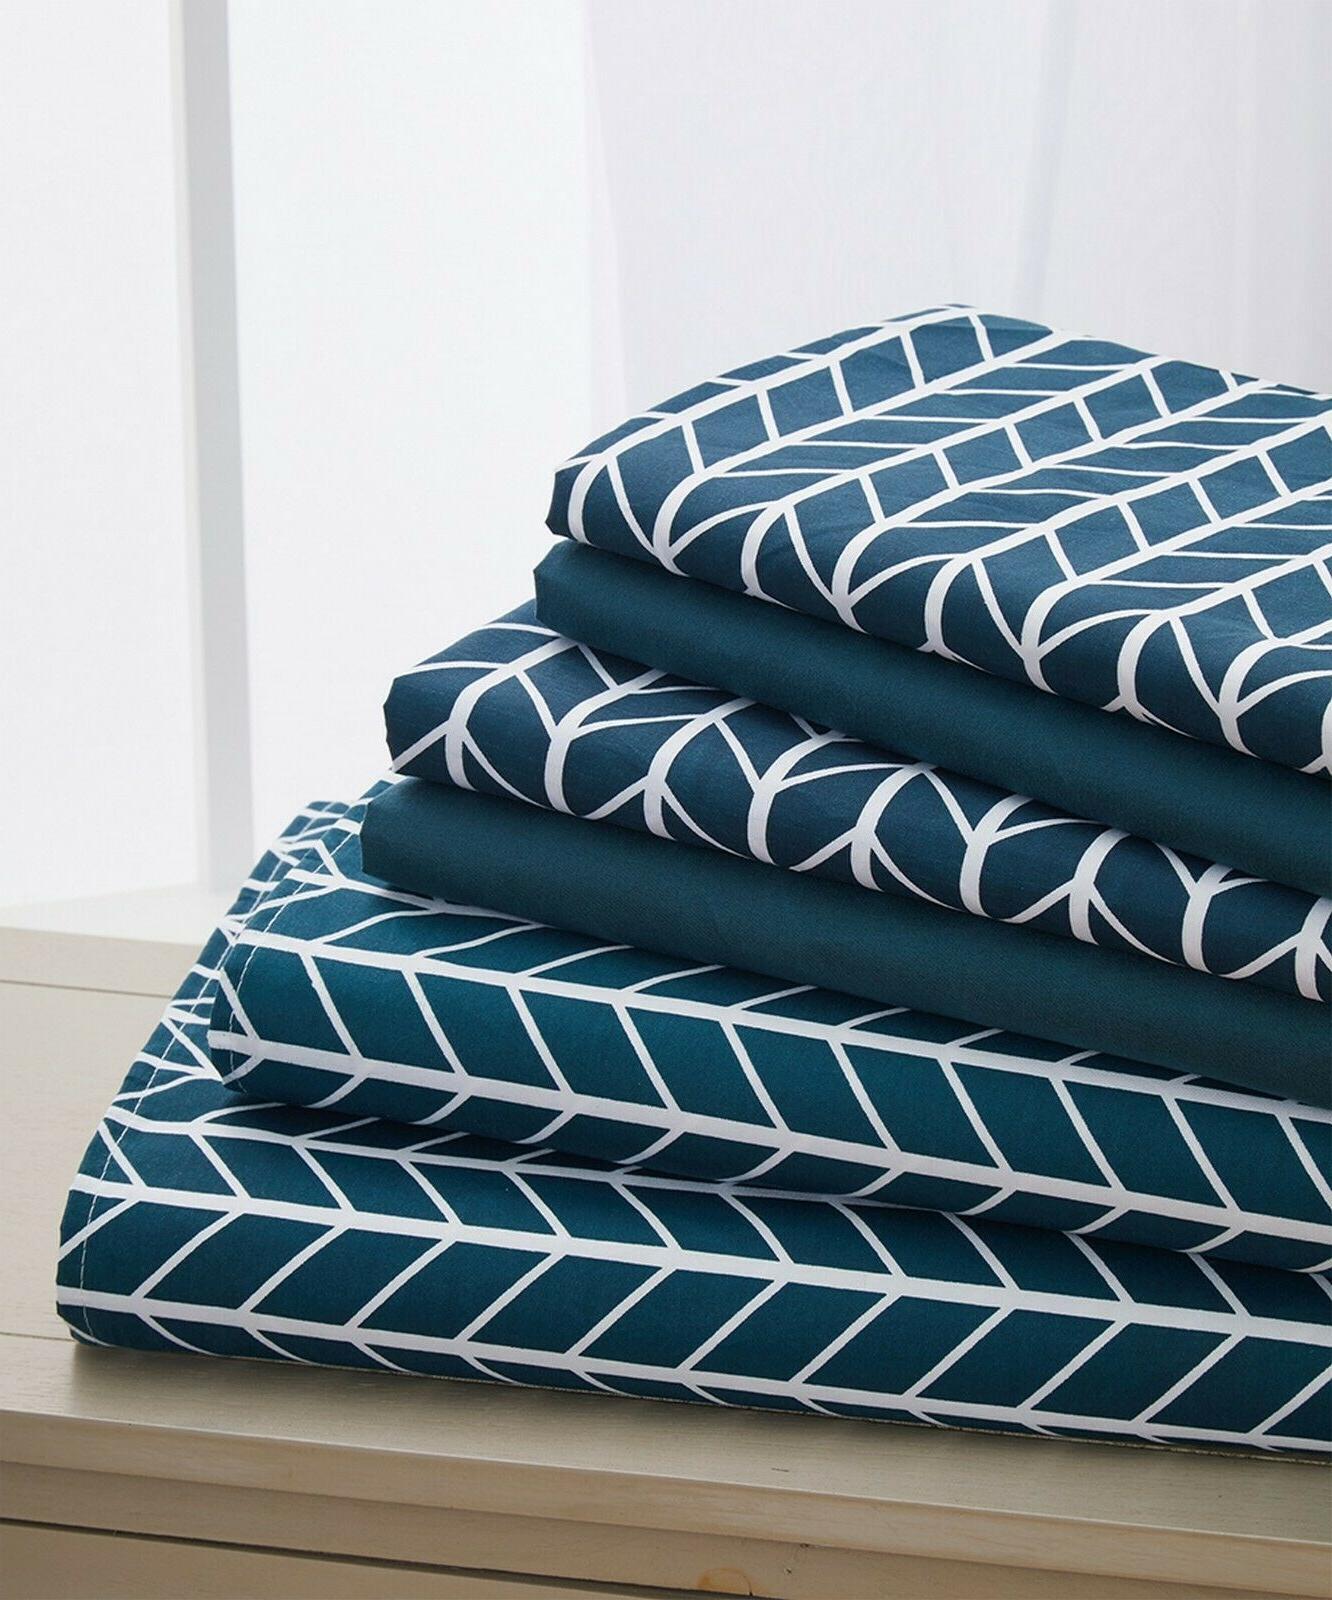 6 piece herringbone pattern bed sheet set